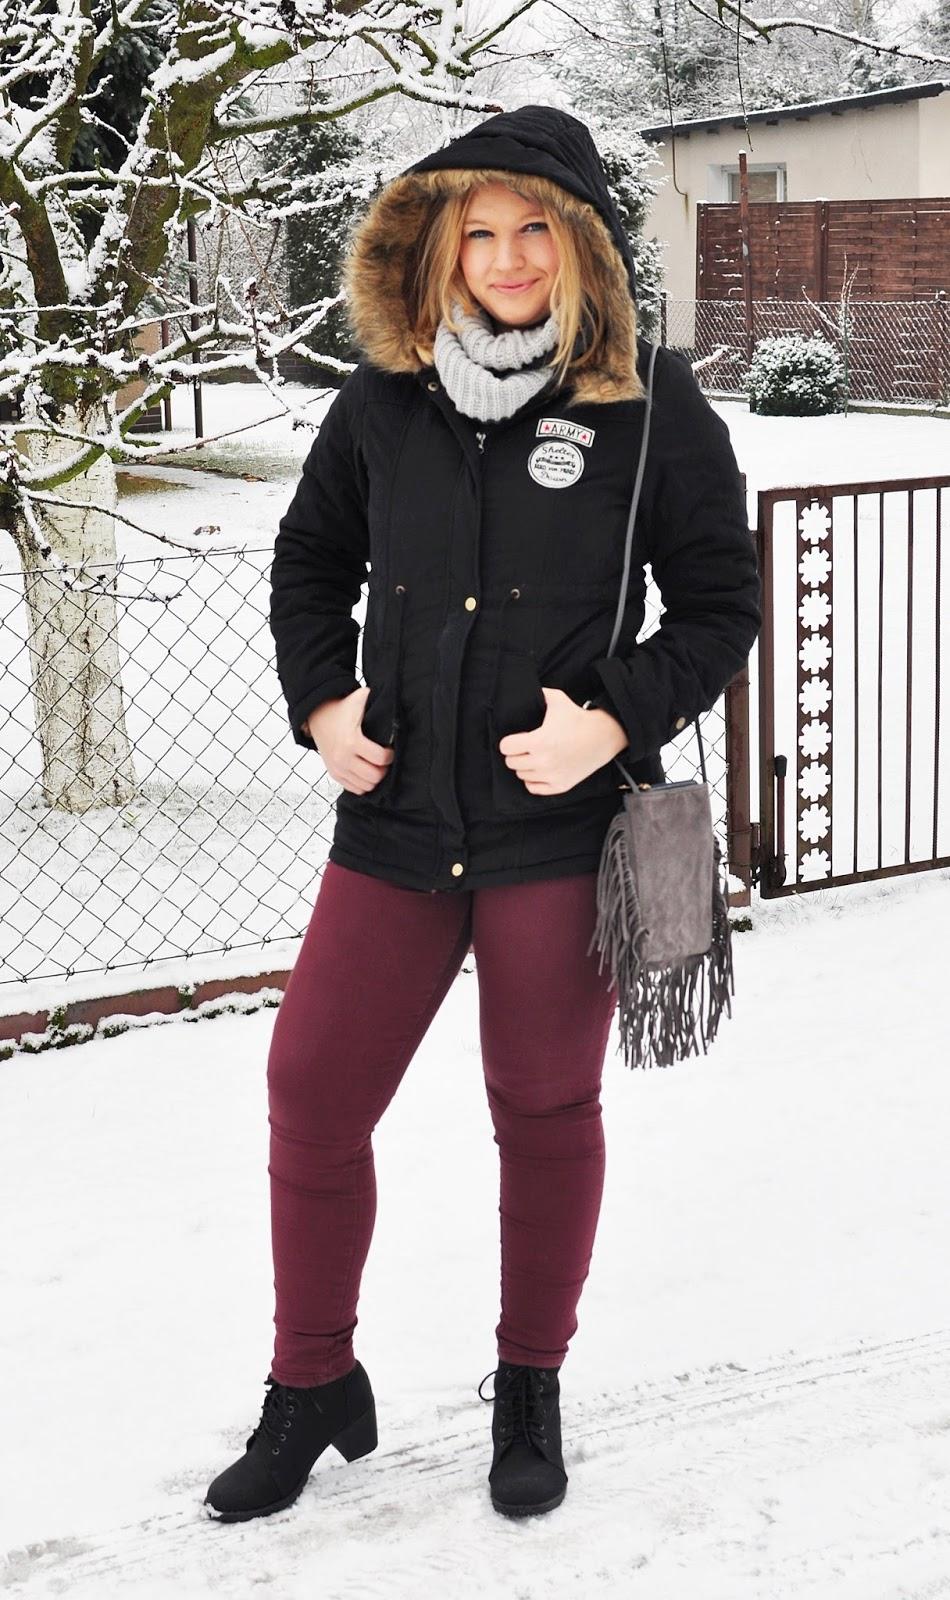 zimowa-stylizacje